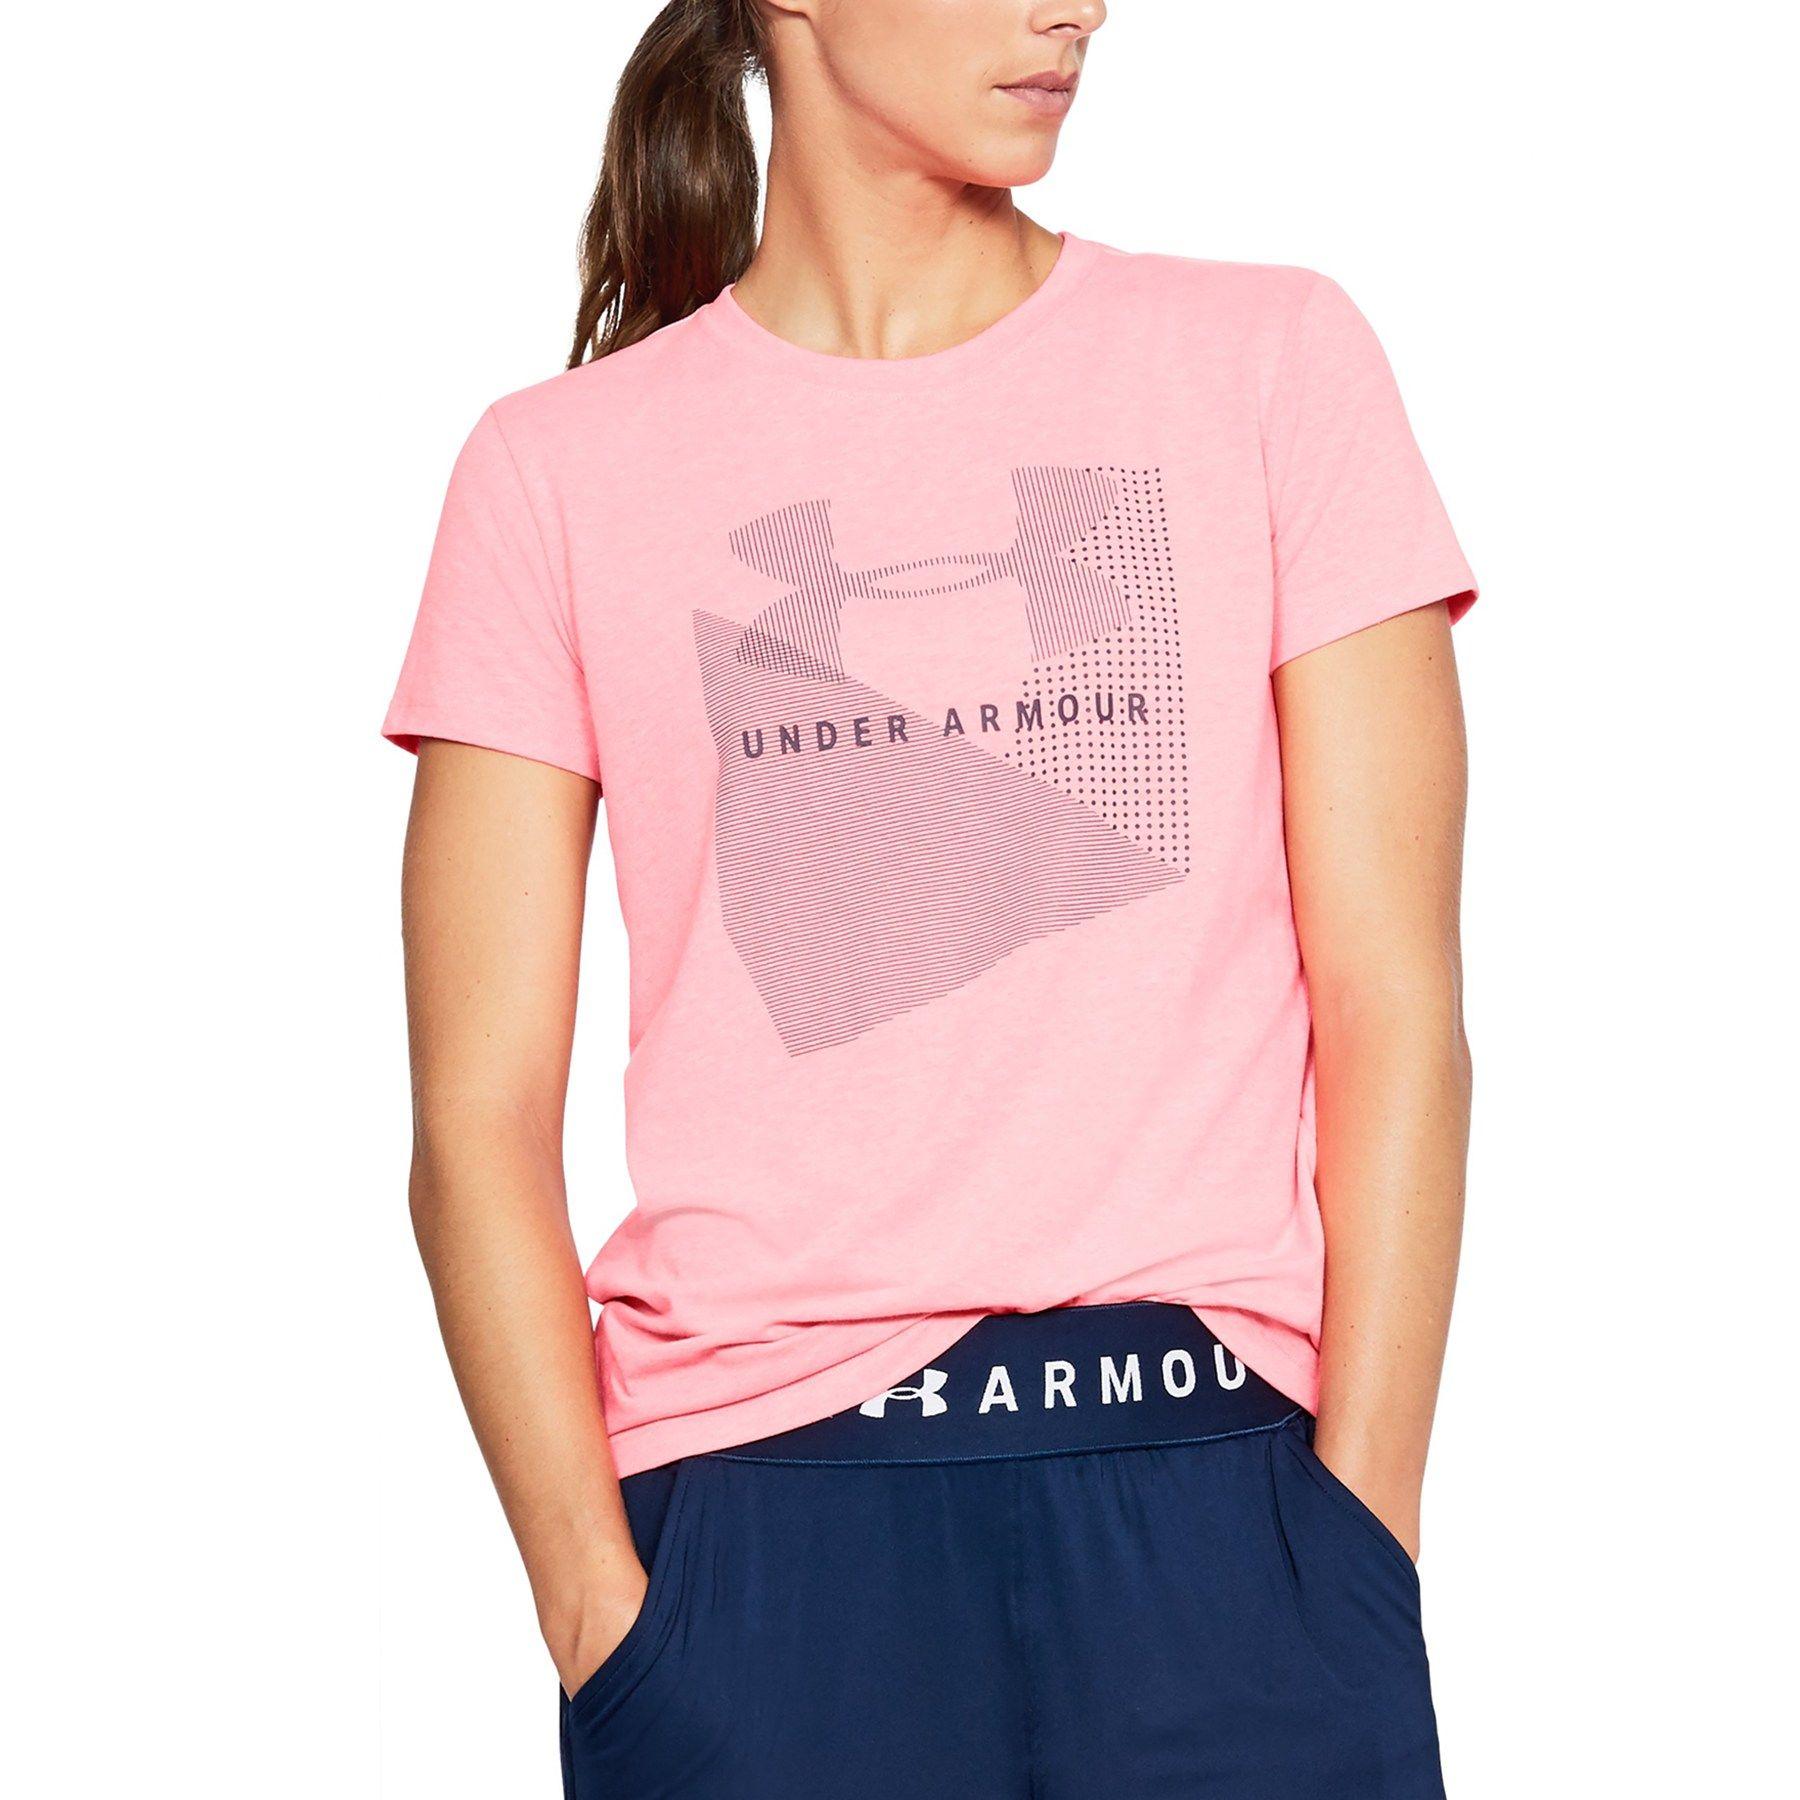 17646f38a Women's Under Armour Sportstyle Logo Crew Graphic Tee #Sportstyle, #Armour,  #Women, #Logo